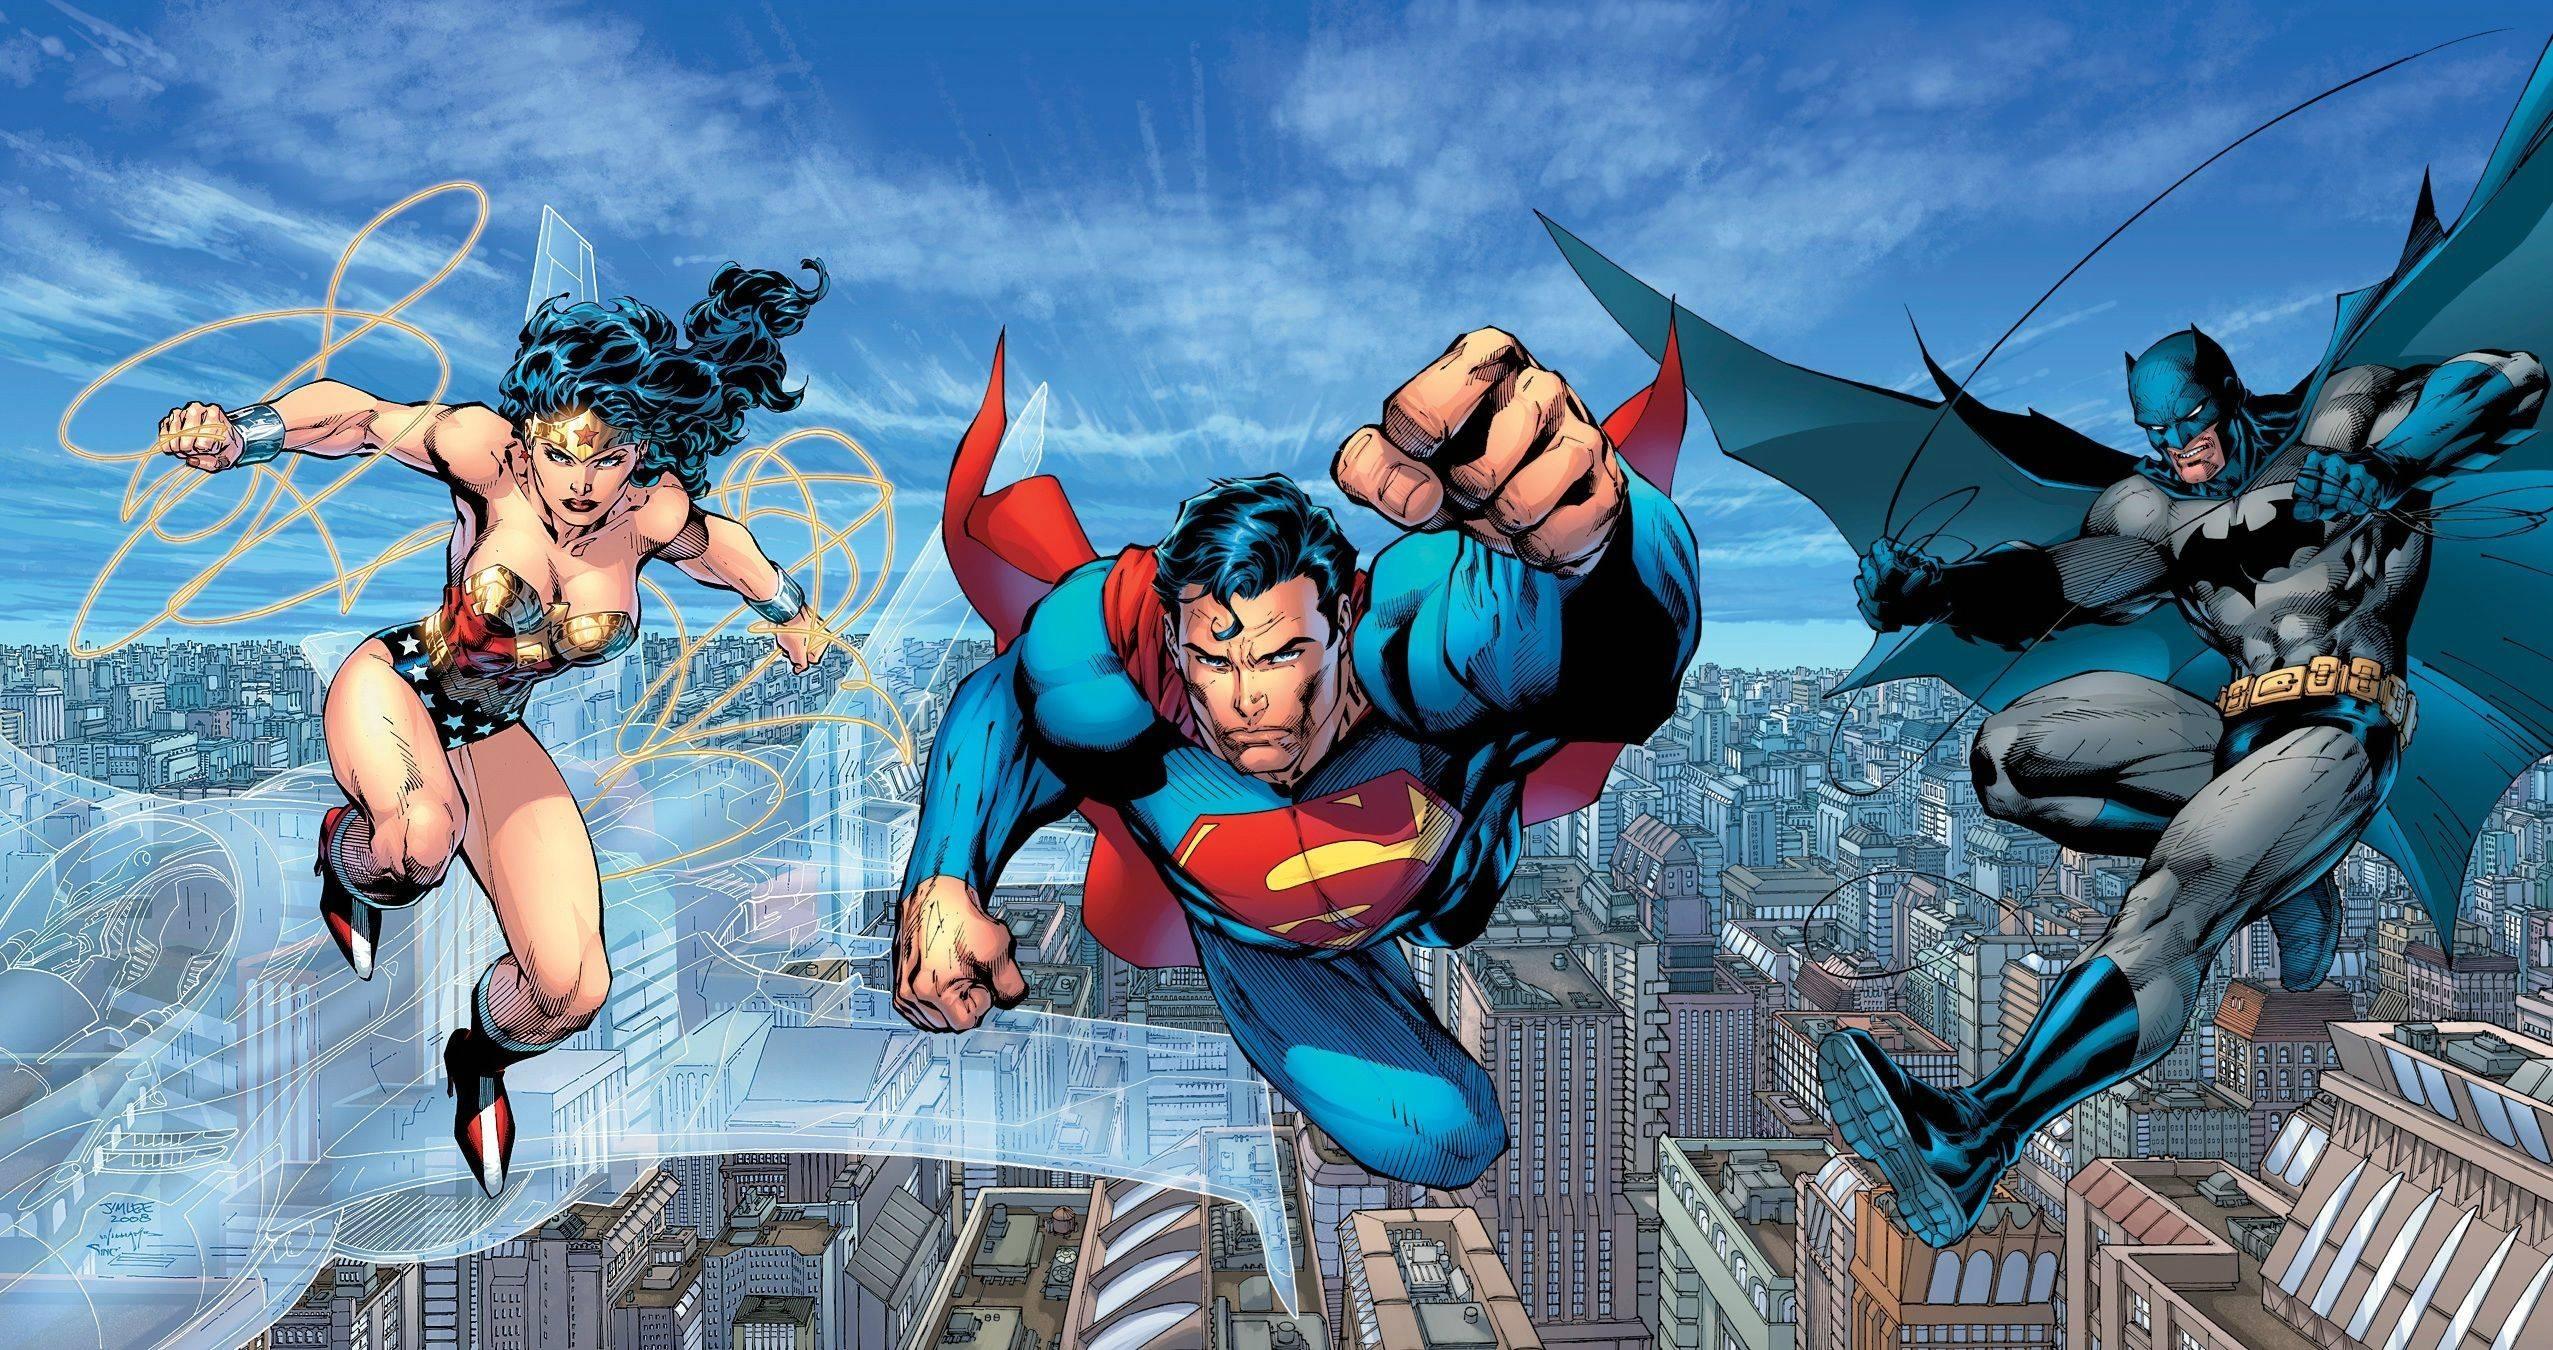 the trinity: a superman, batman & wonder woman desktop wallpaper